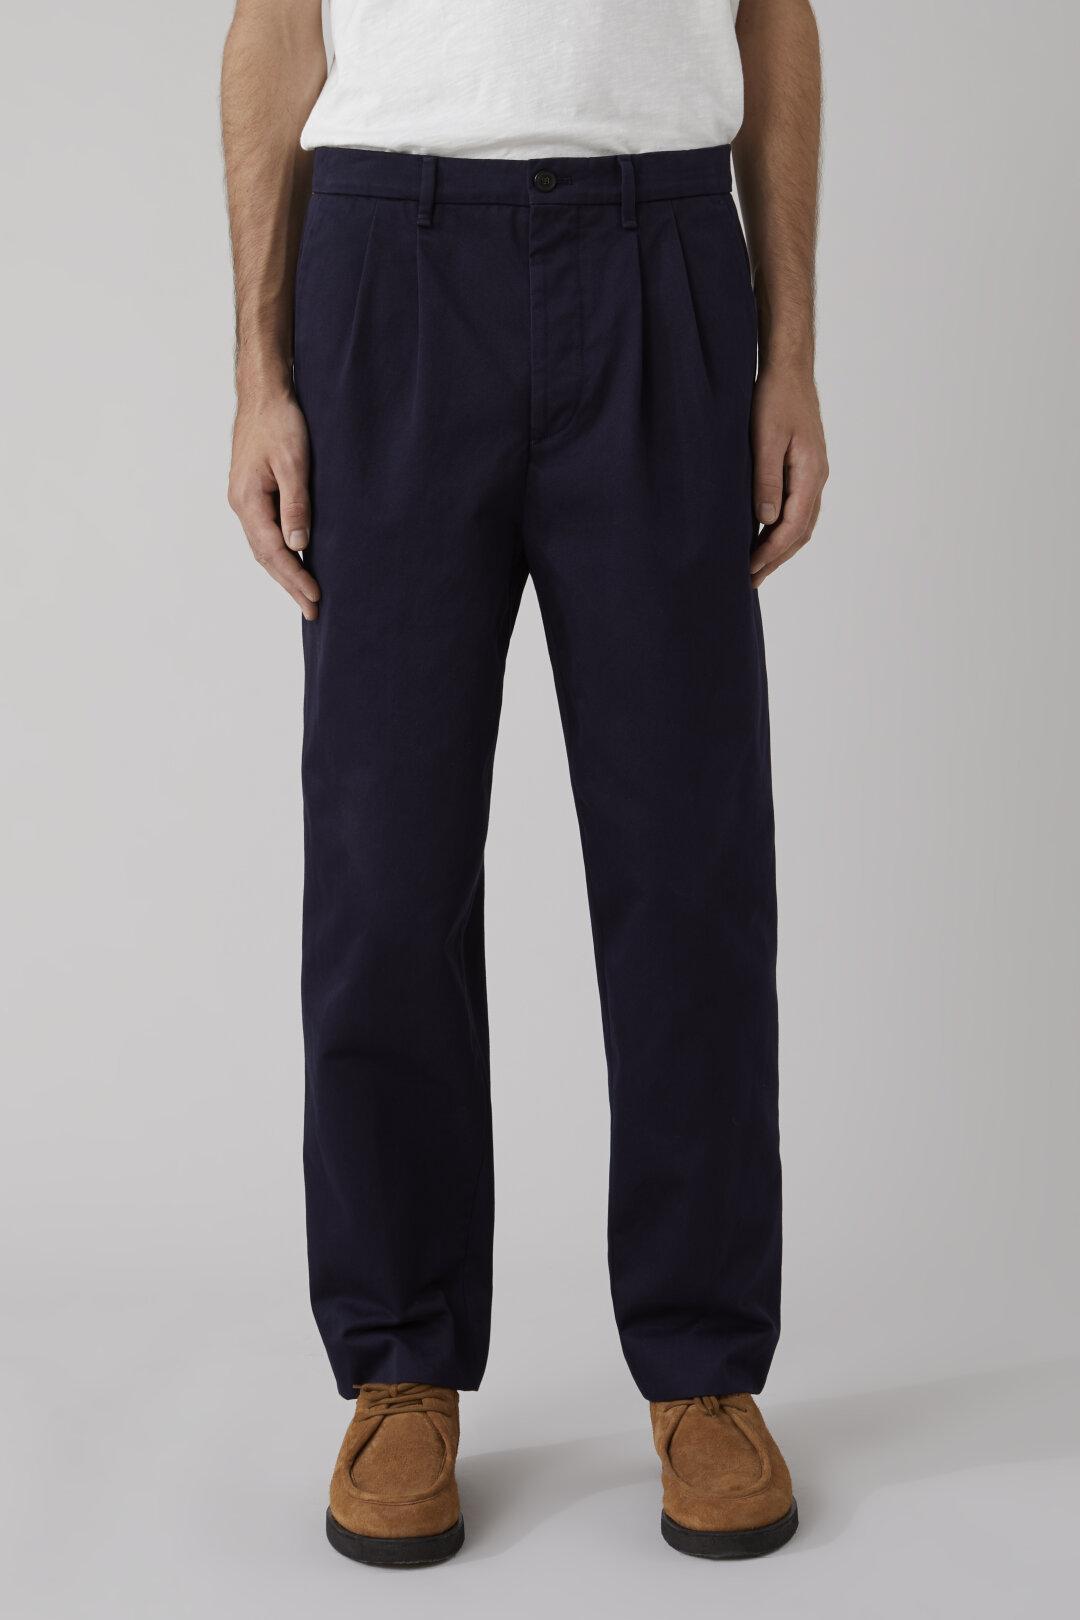 Port Wide Pants